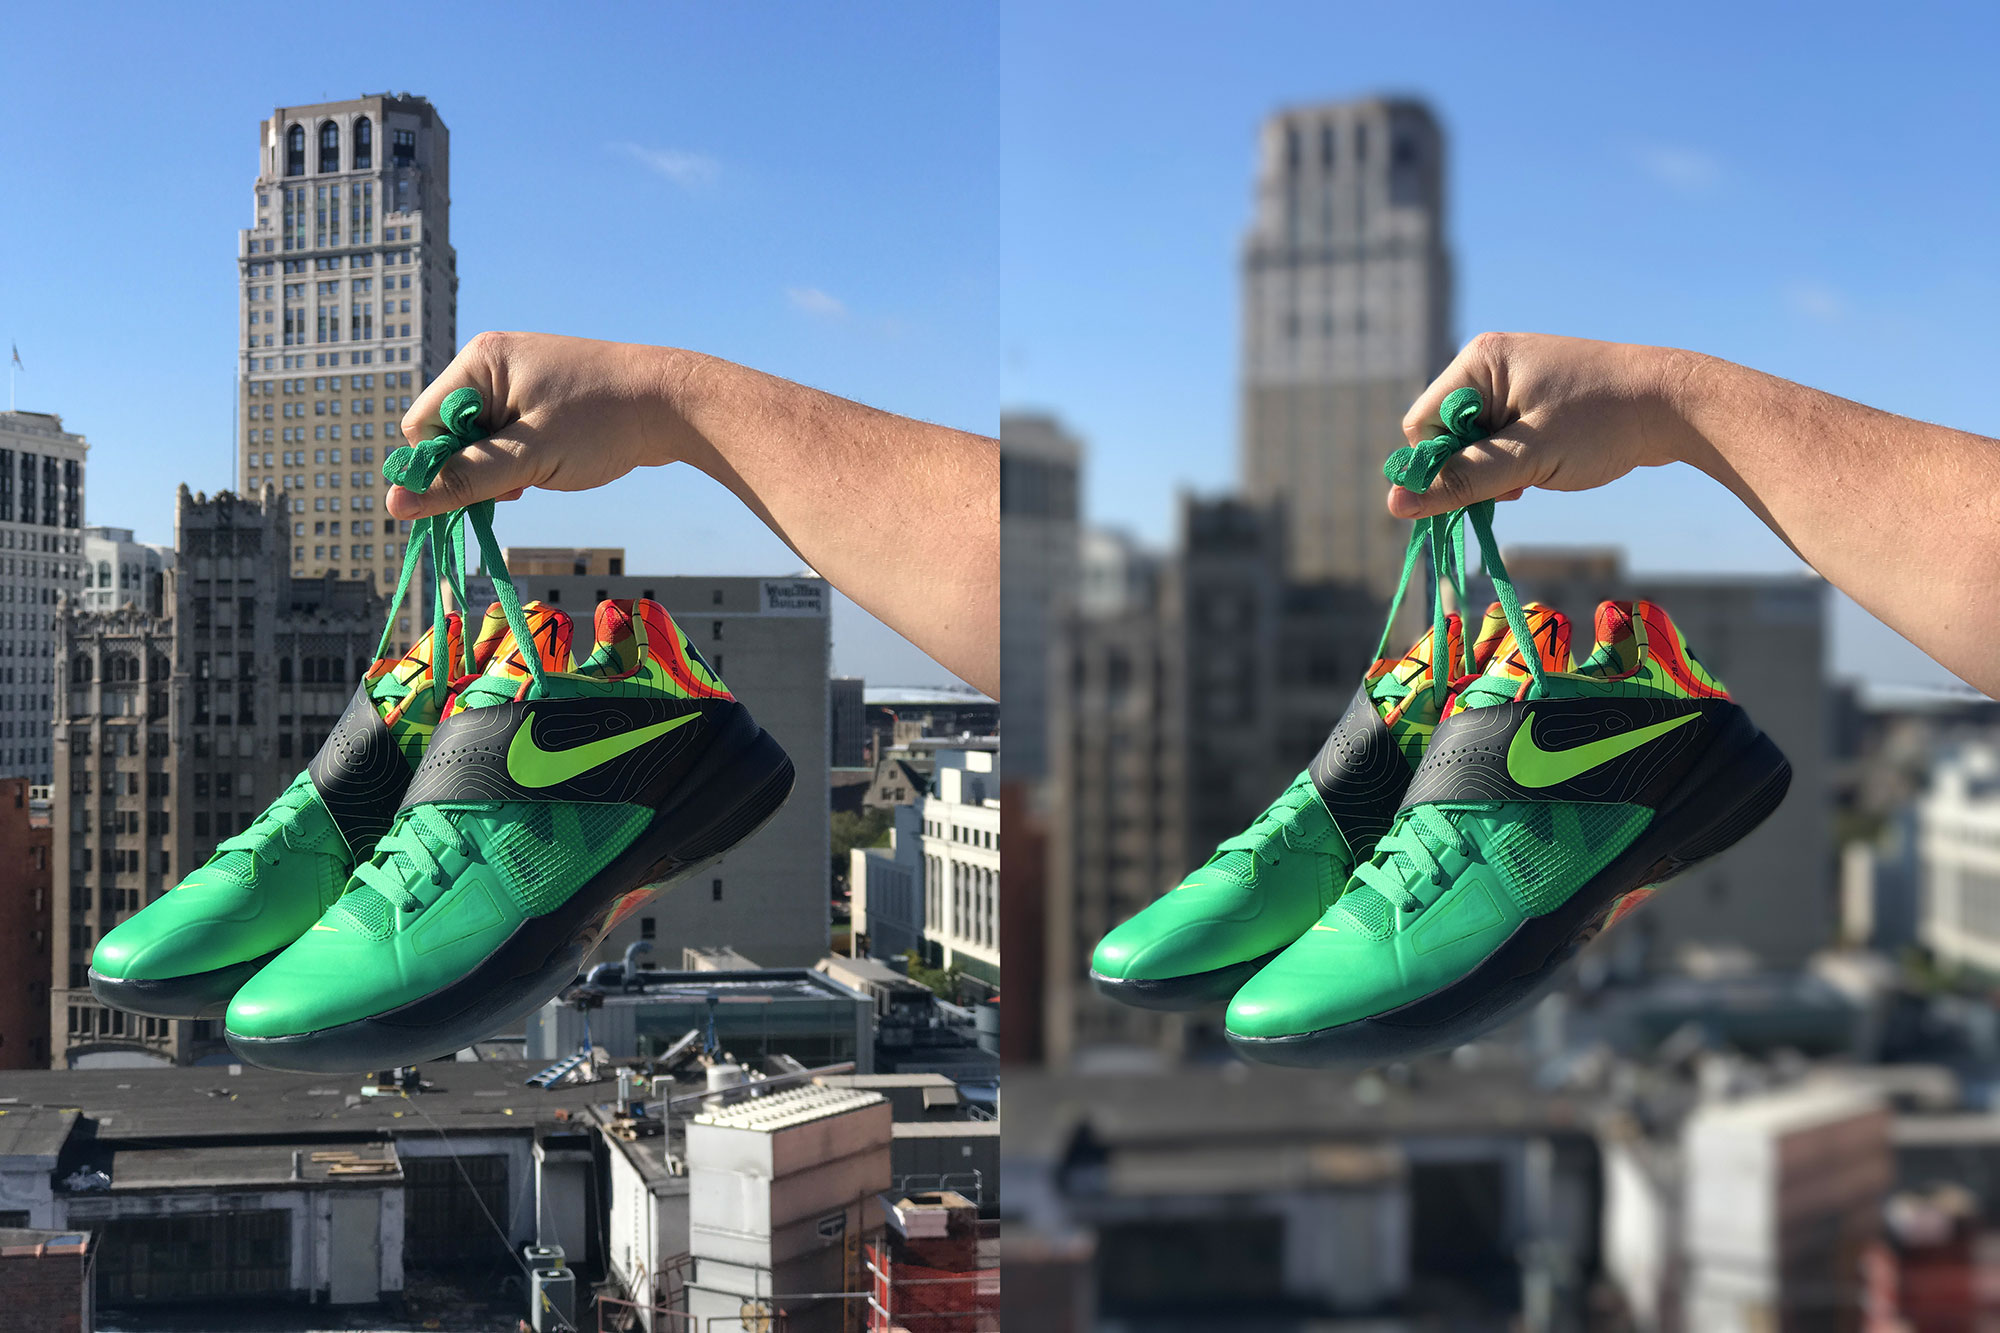 Nike KD 4 Weatherman - iPhone 7 Plus Bokeh Depth Effect Review